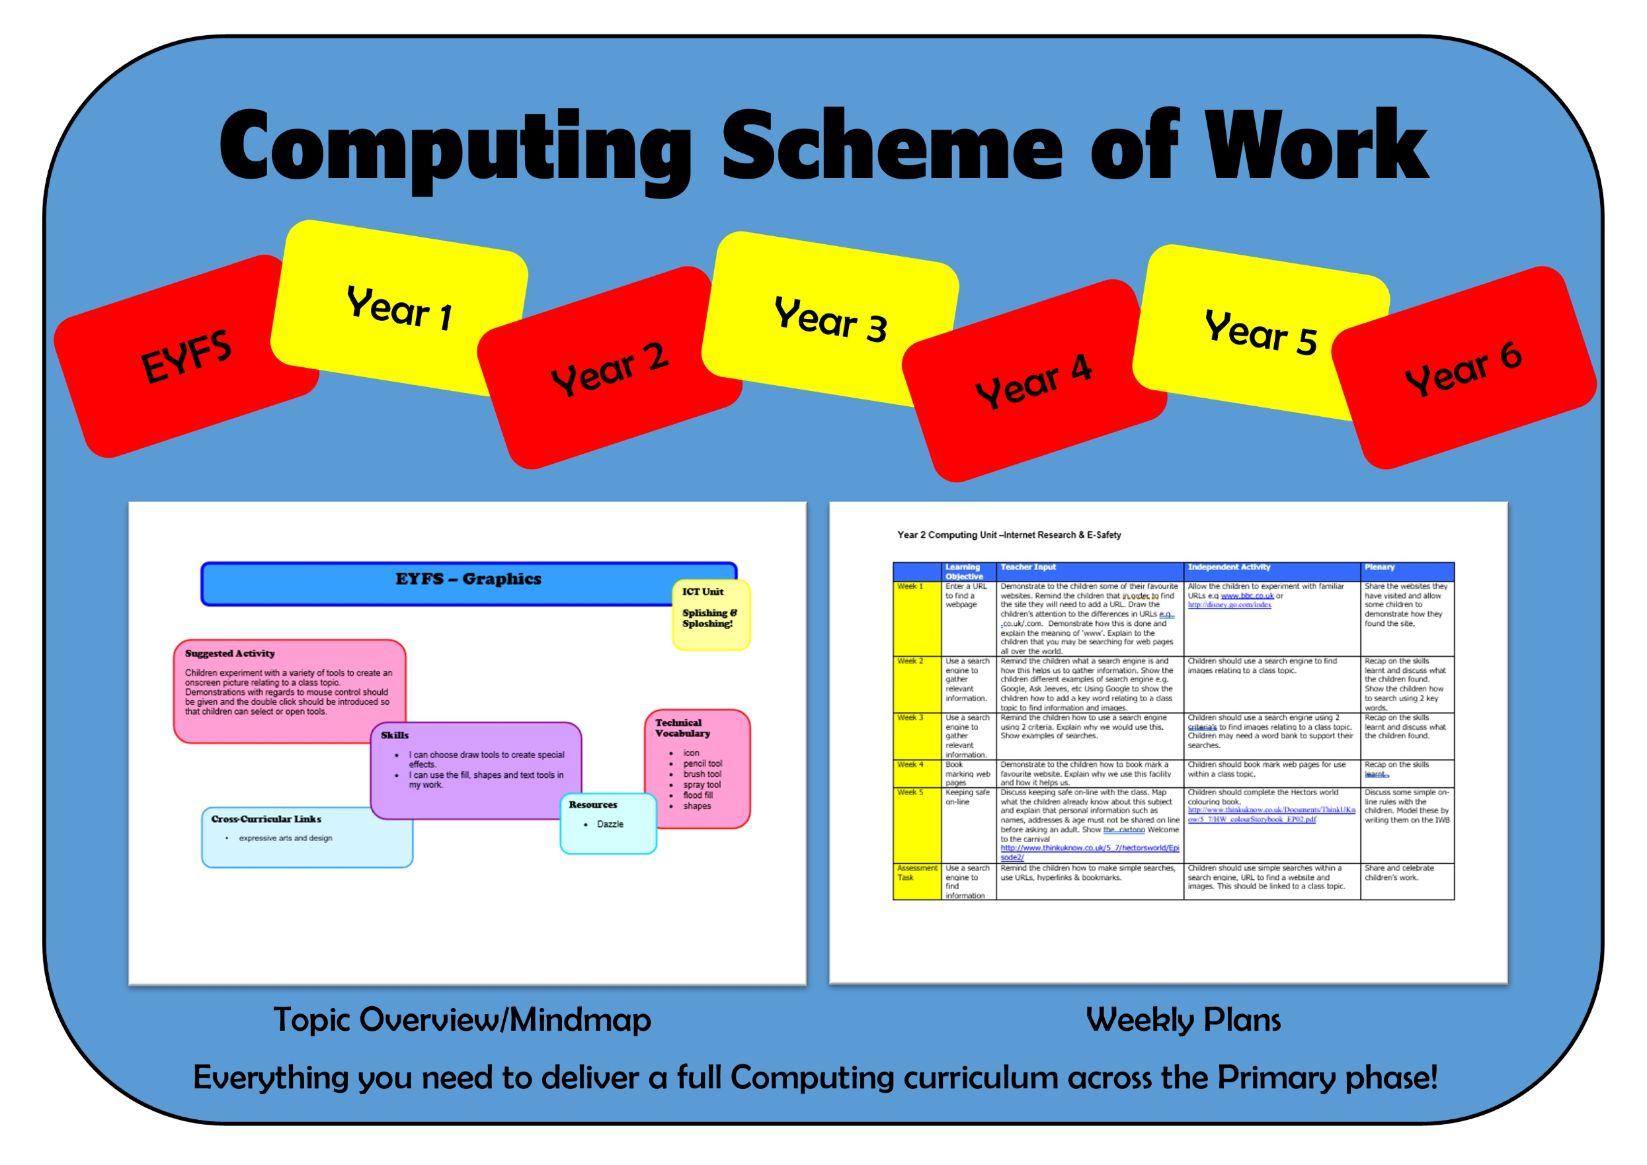 Primary 3-11 Computing Scheme of Work